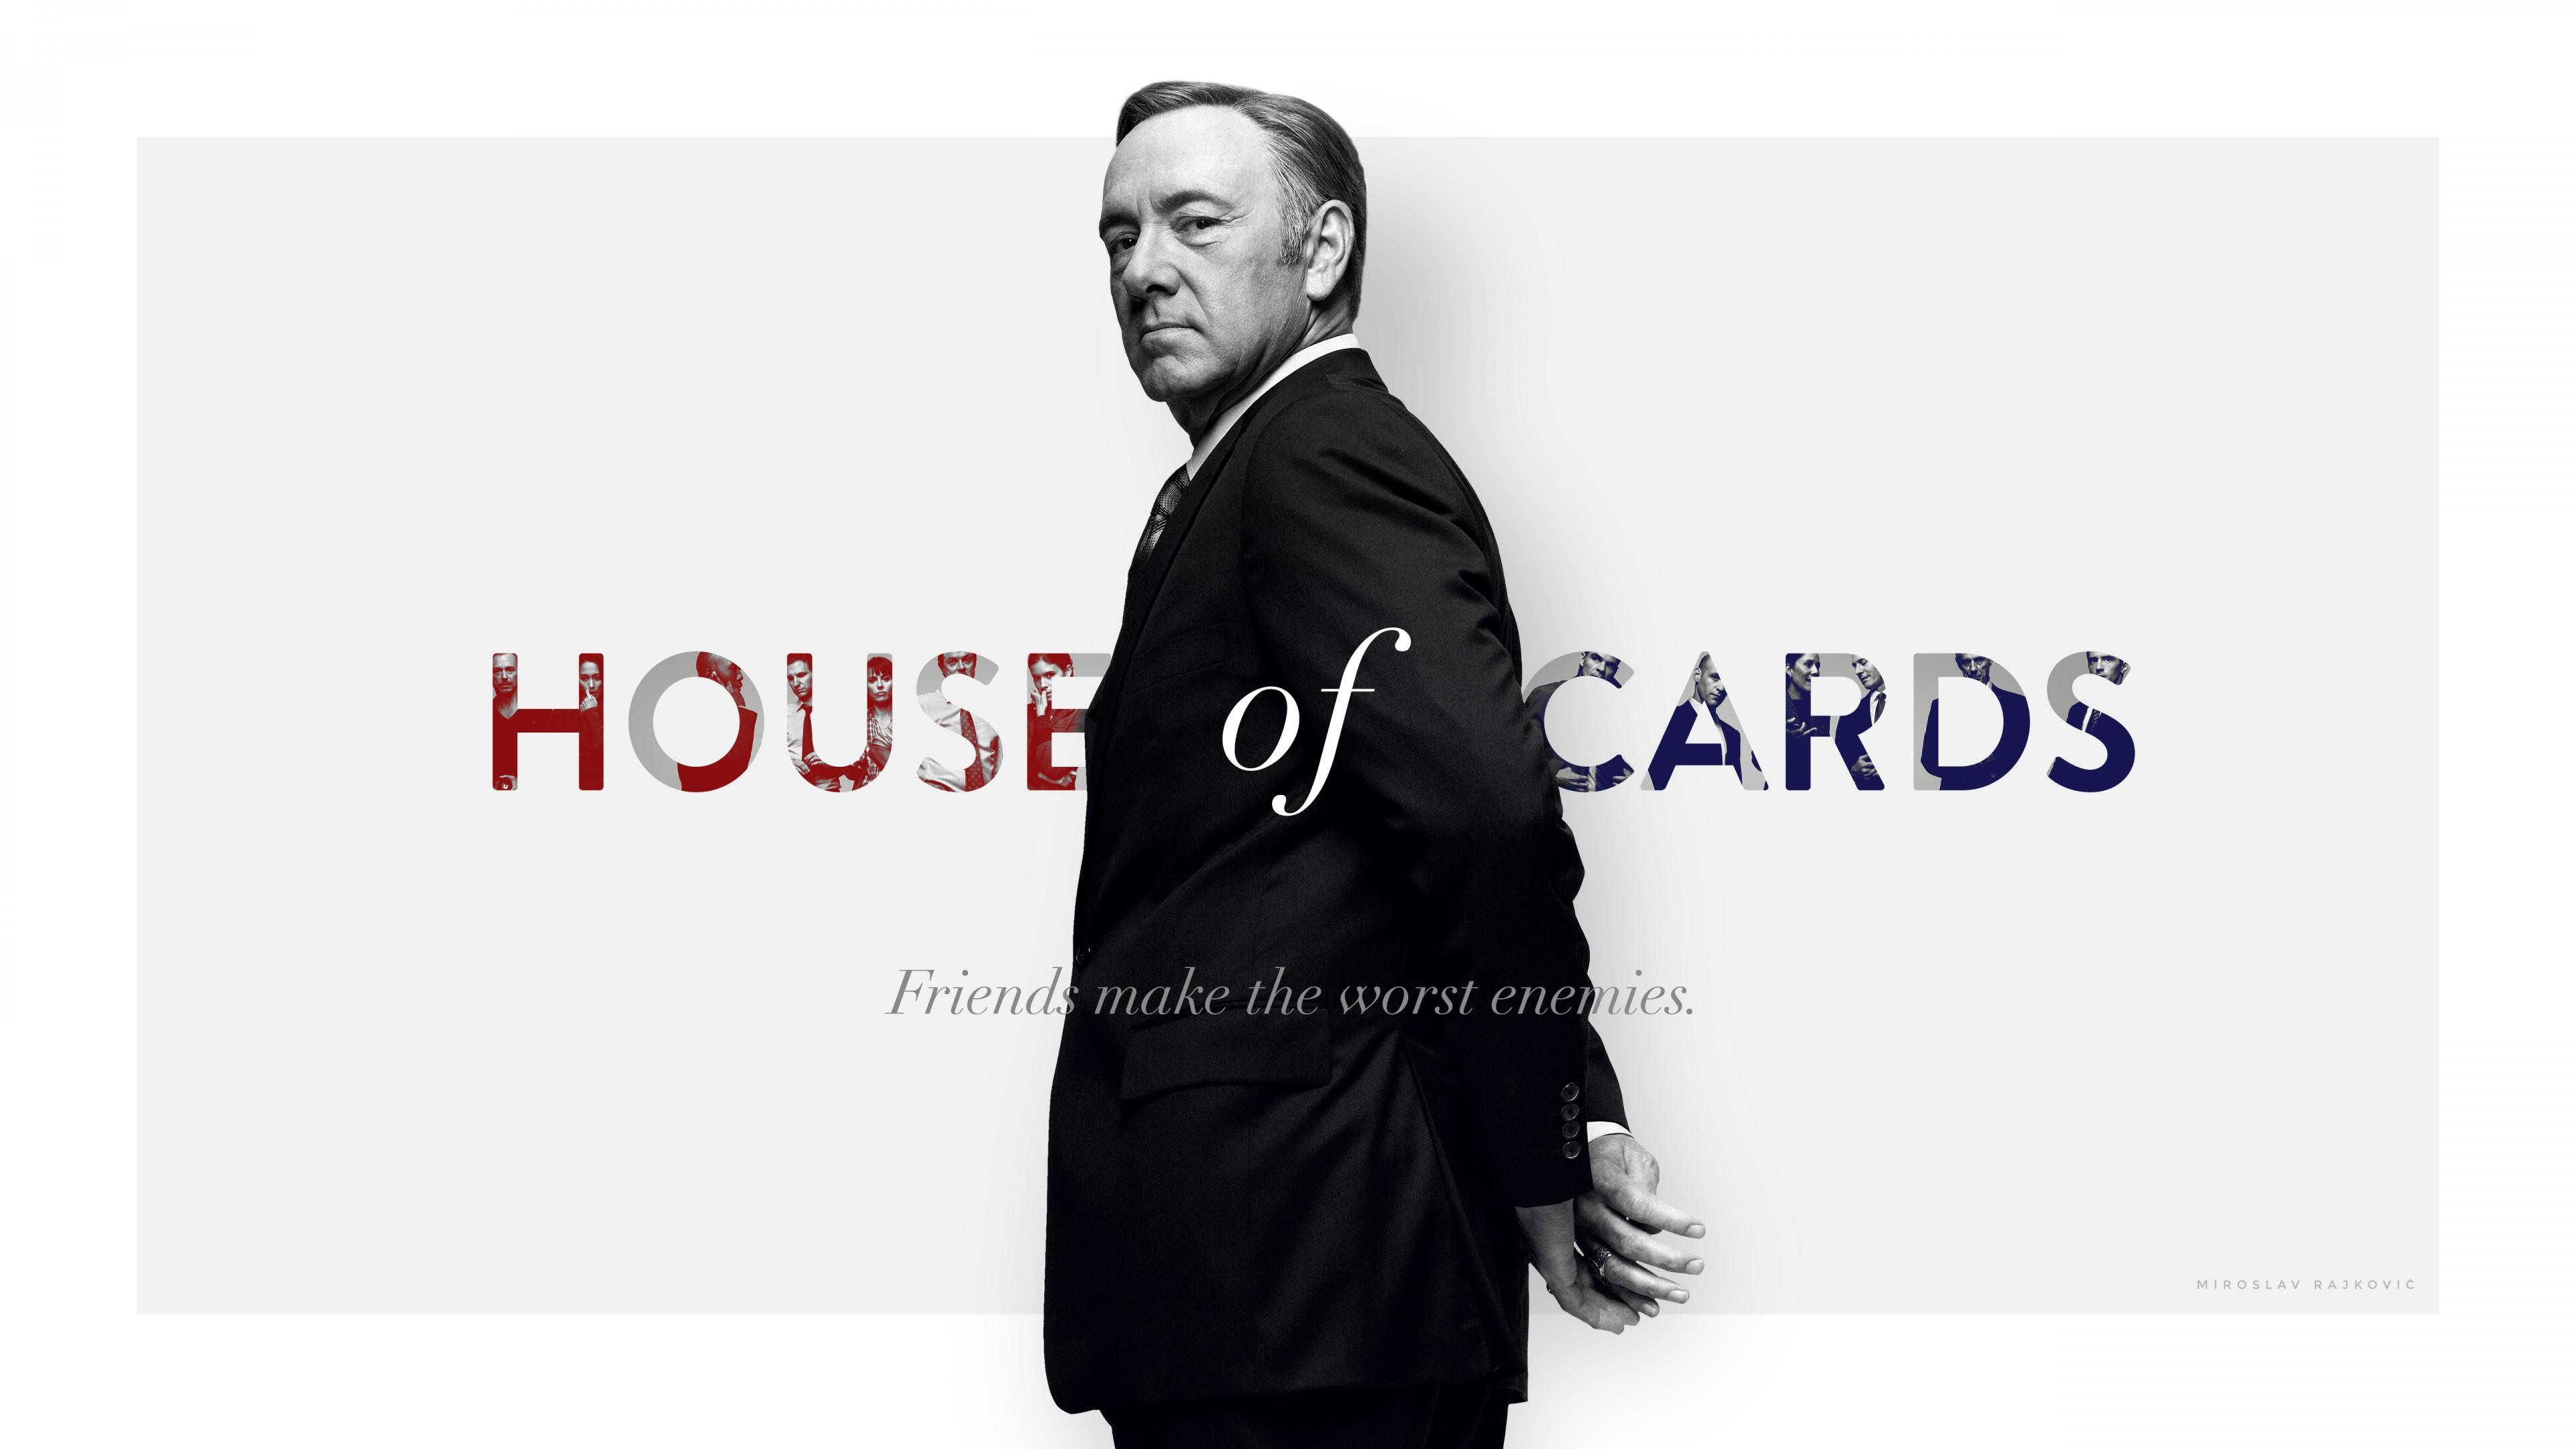 House of cards season 2 wallpaper